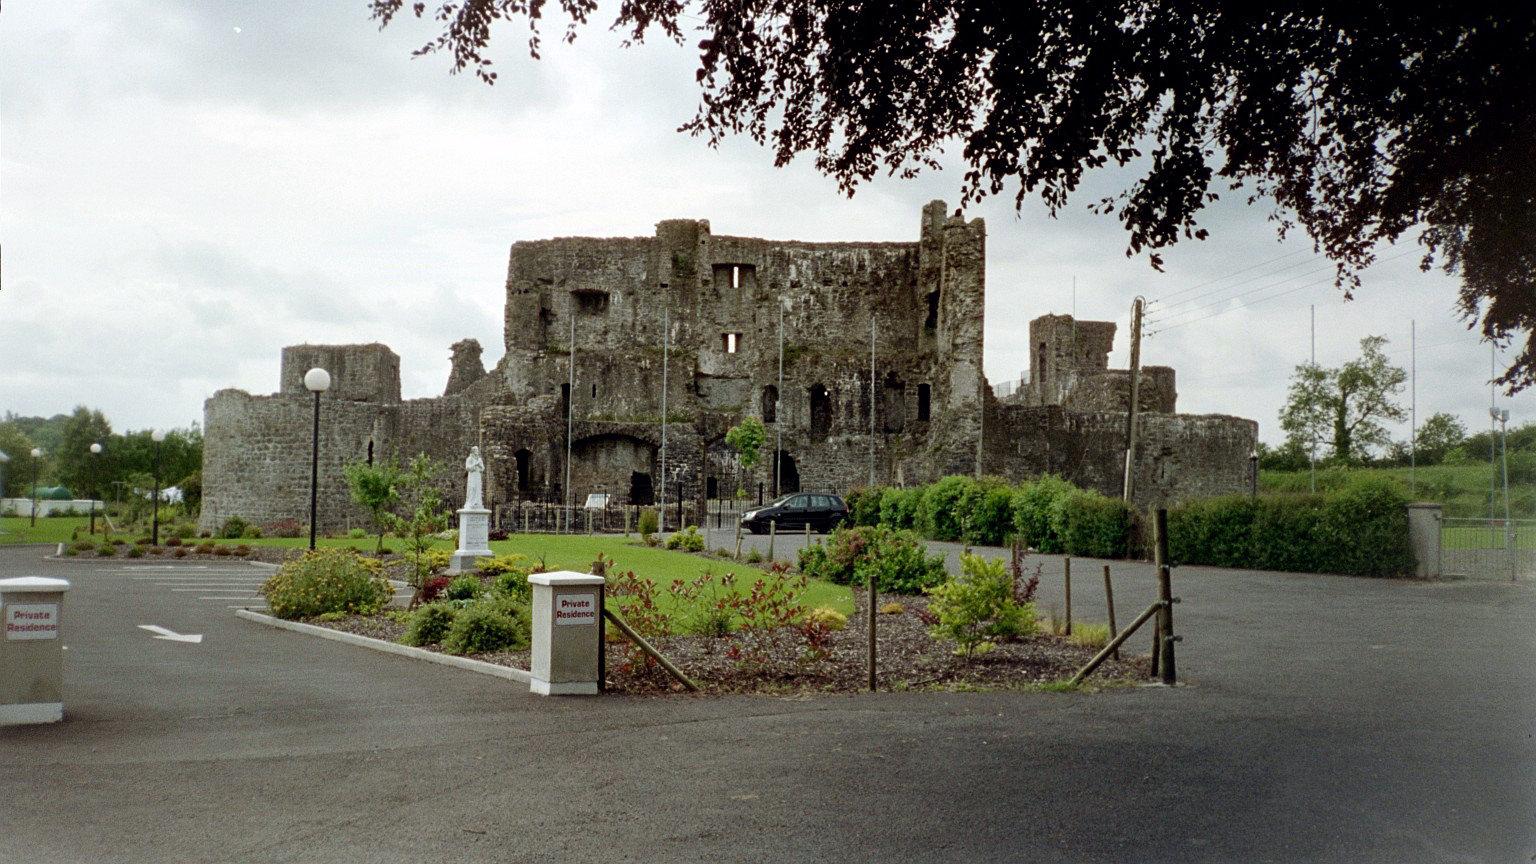 Ballymote-Tobercurry Agendas 2016 - Sligo County Council